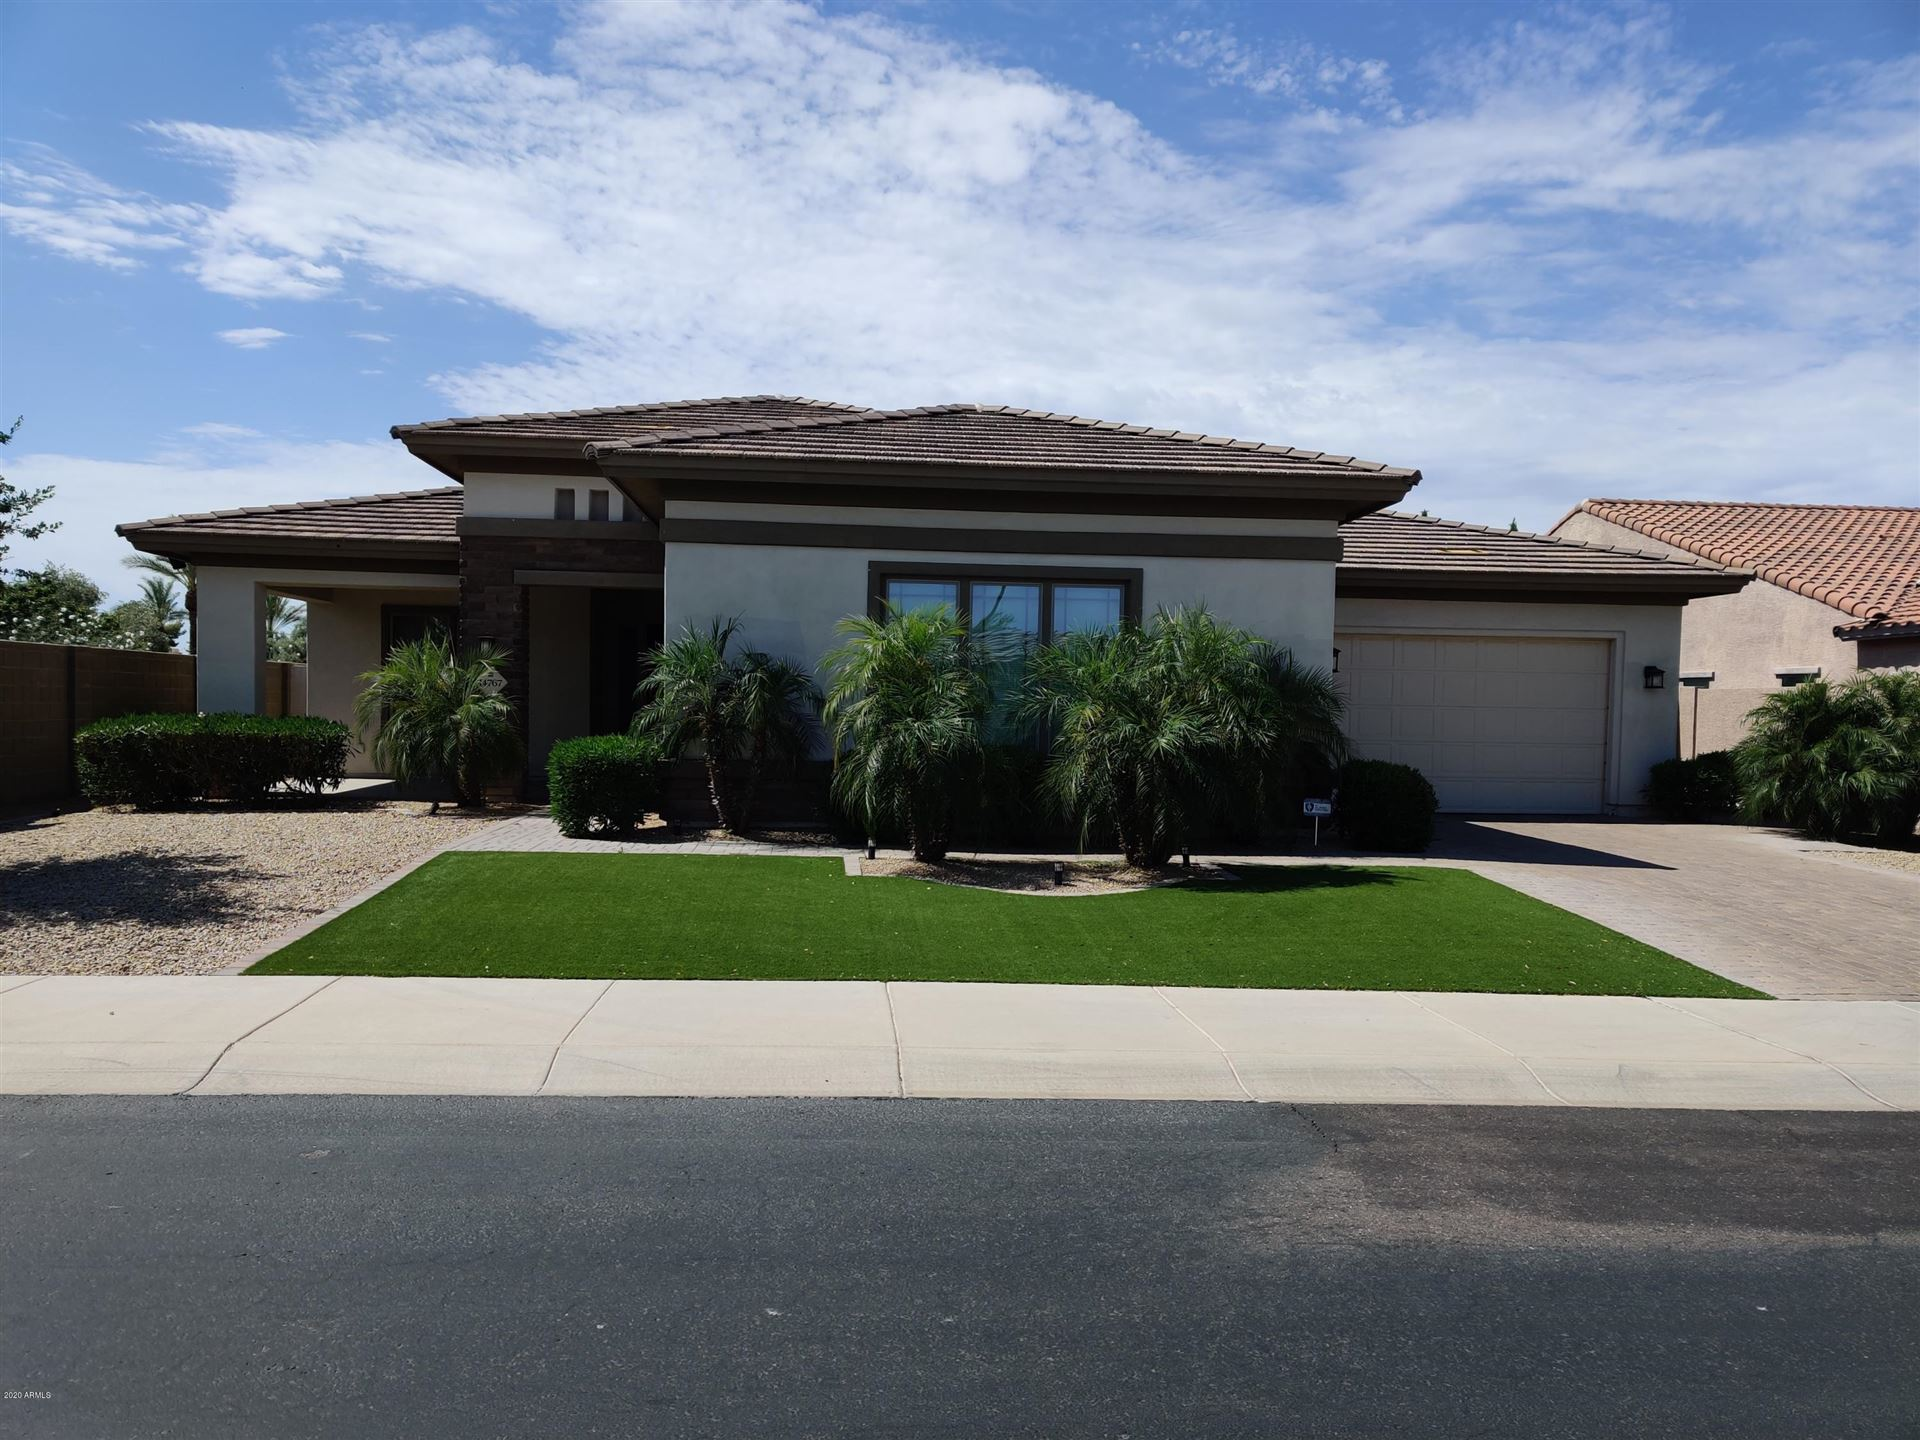 14767 W ESCONDIDO Drive N, Litchfield Park, AZ 85340 - MLS#: 6089270